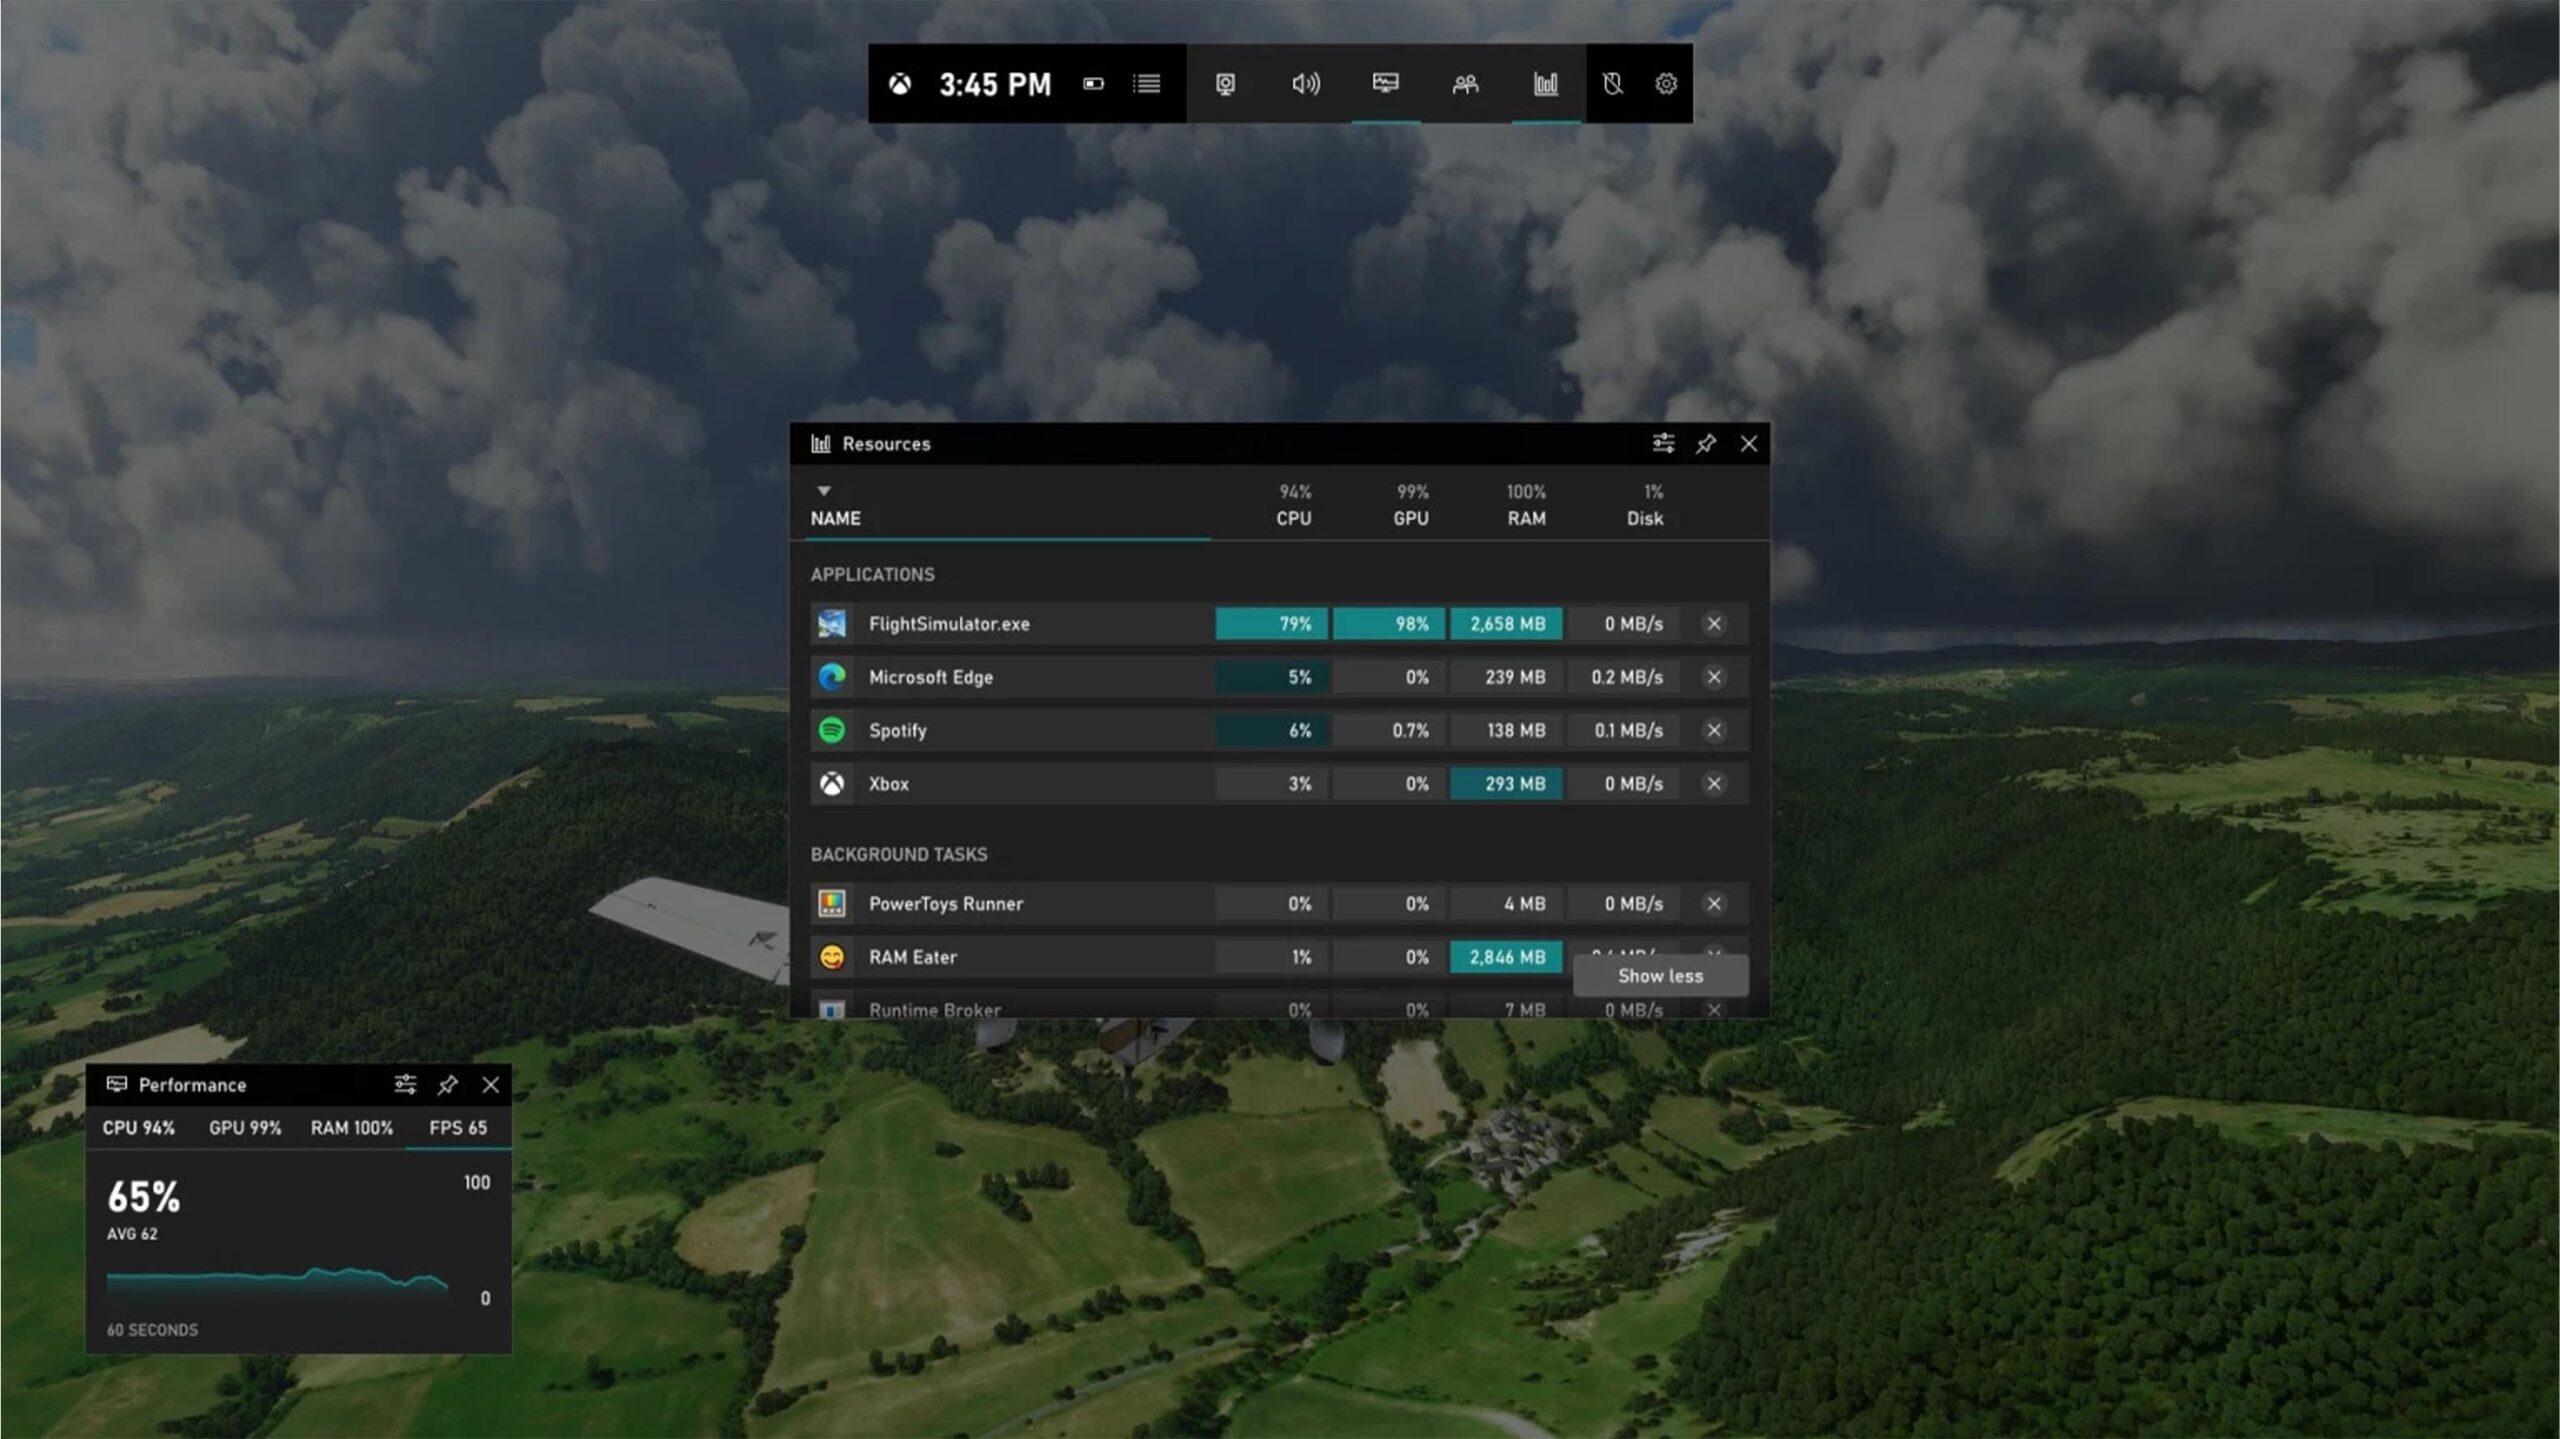 Resource widget on Xbox Game Bar